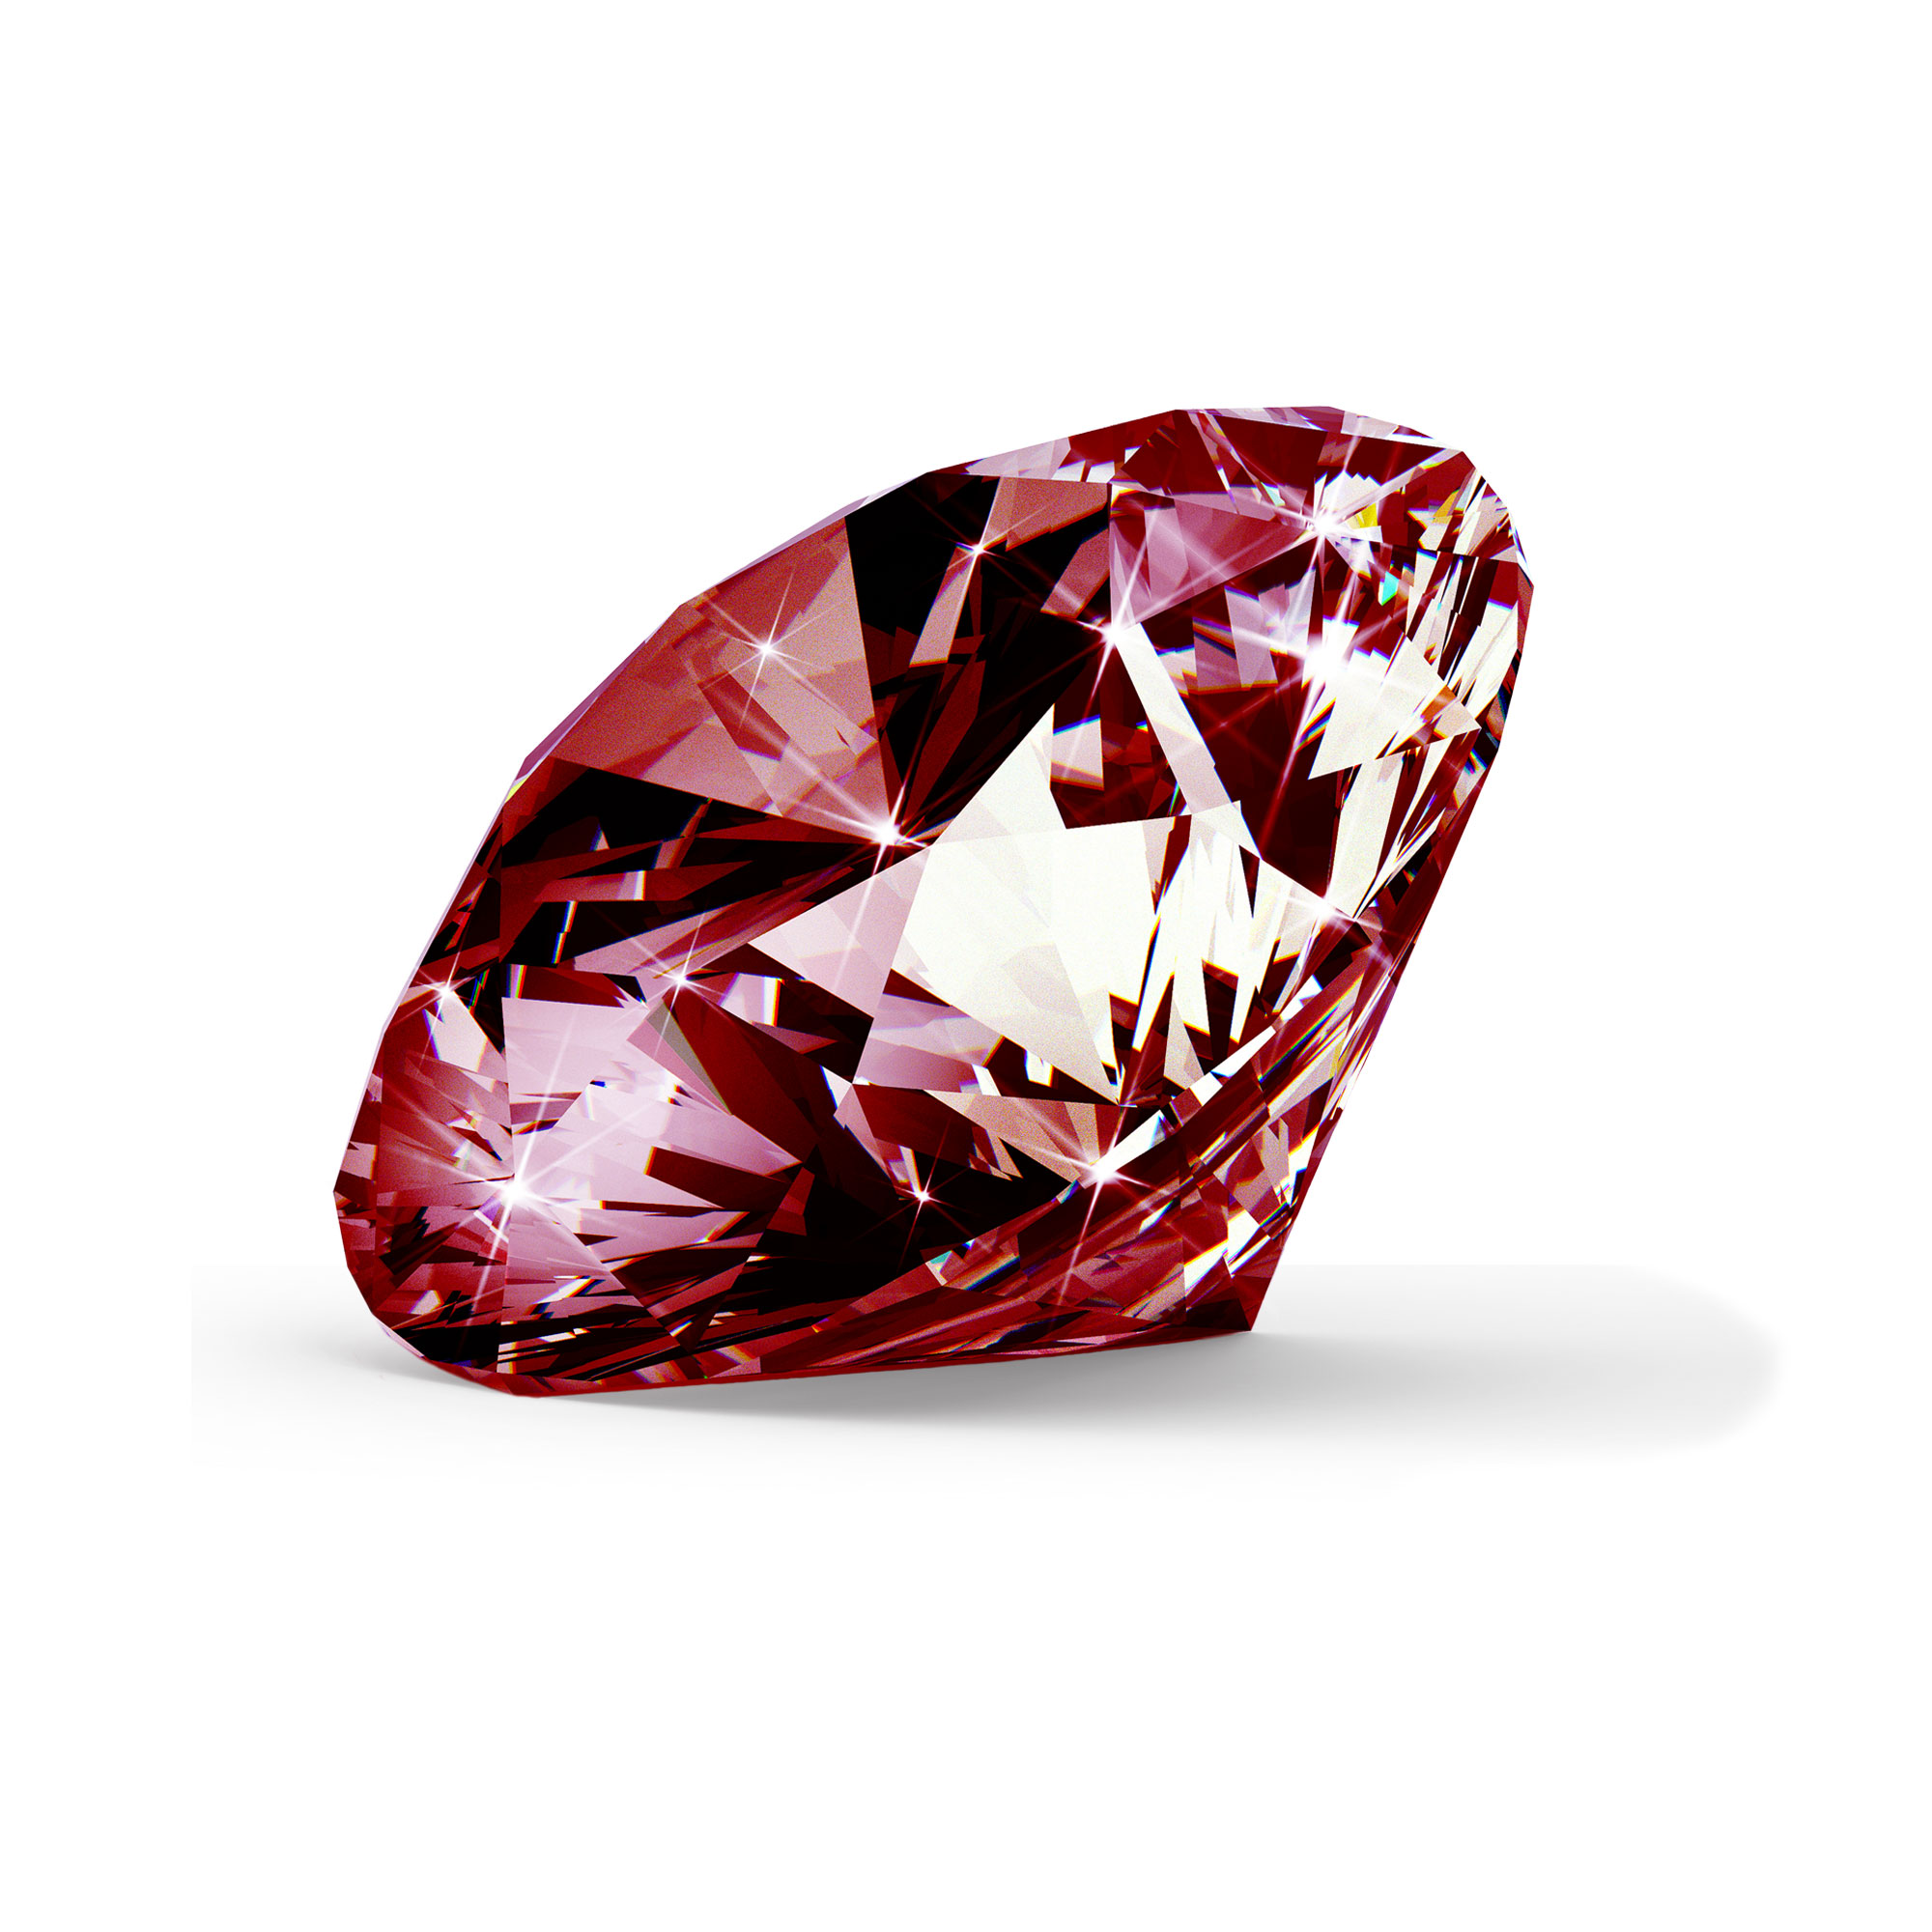 Rød diamant brilliant round cut fra siden